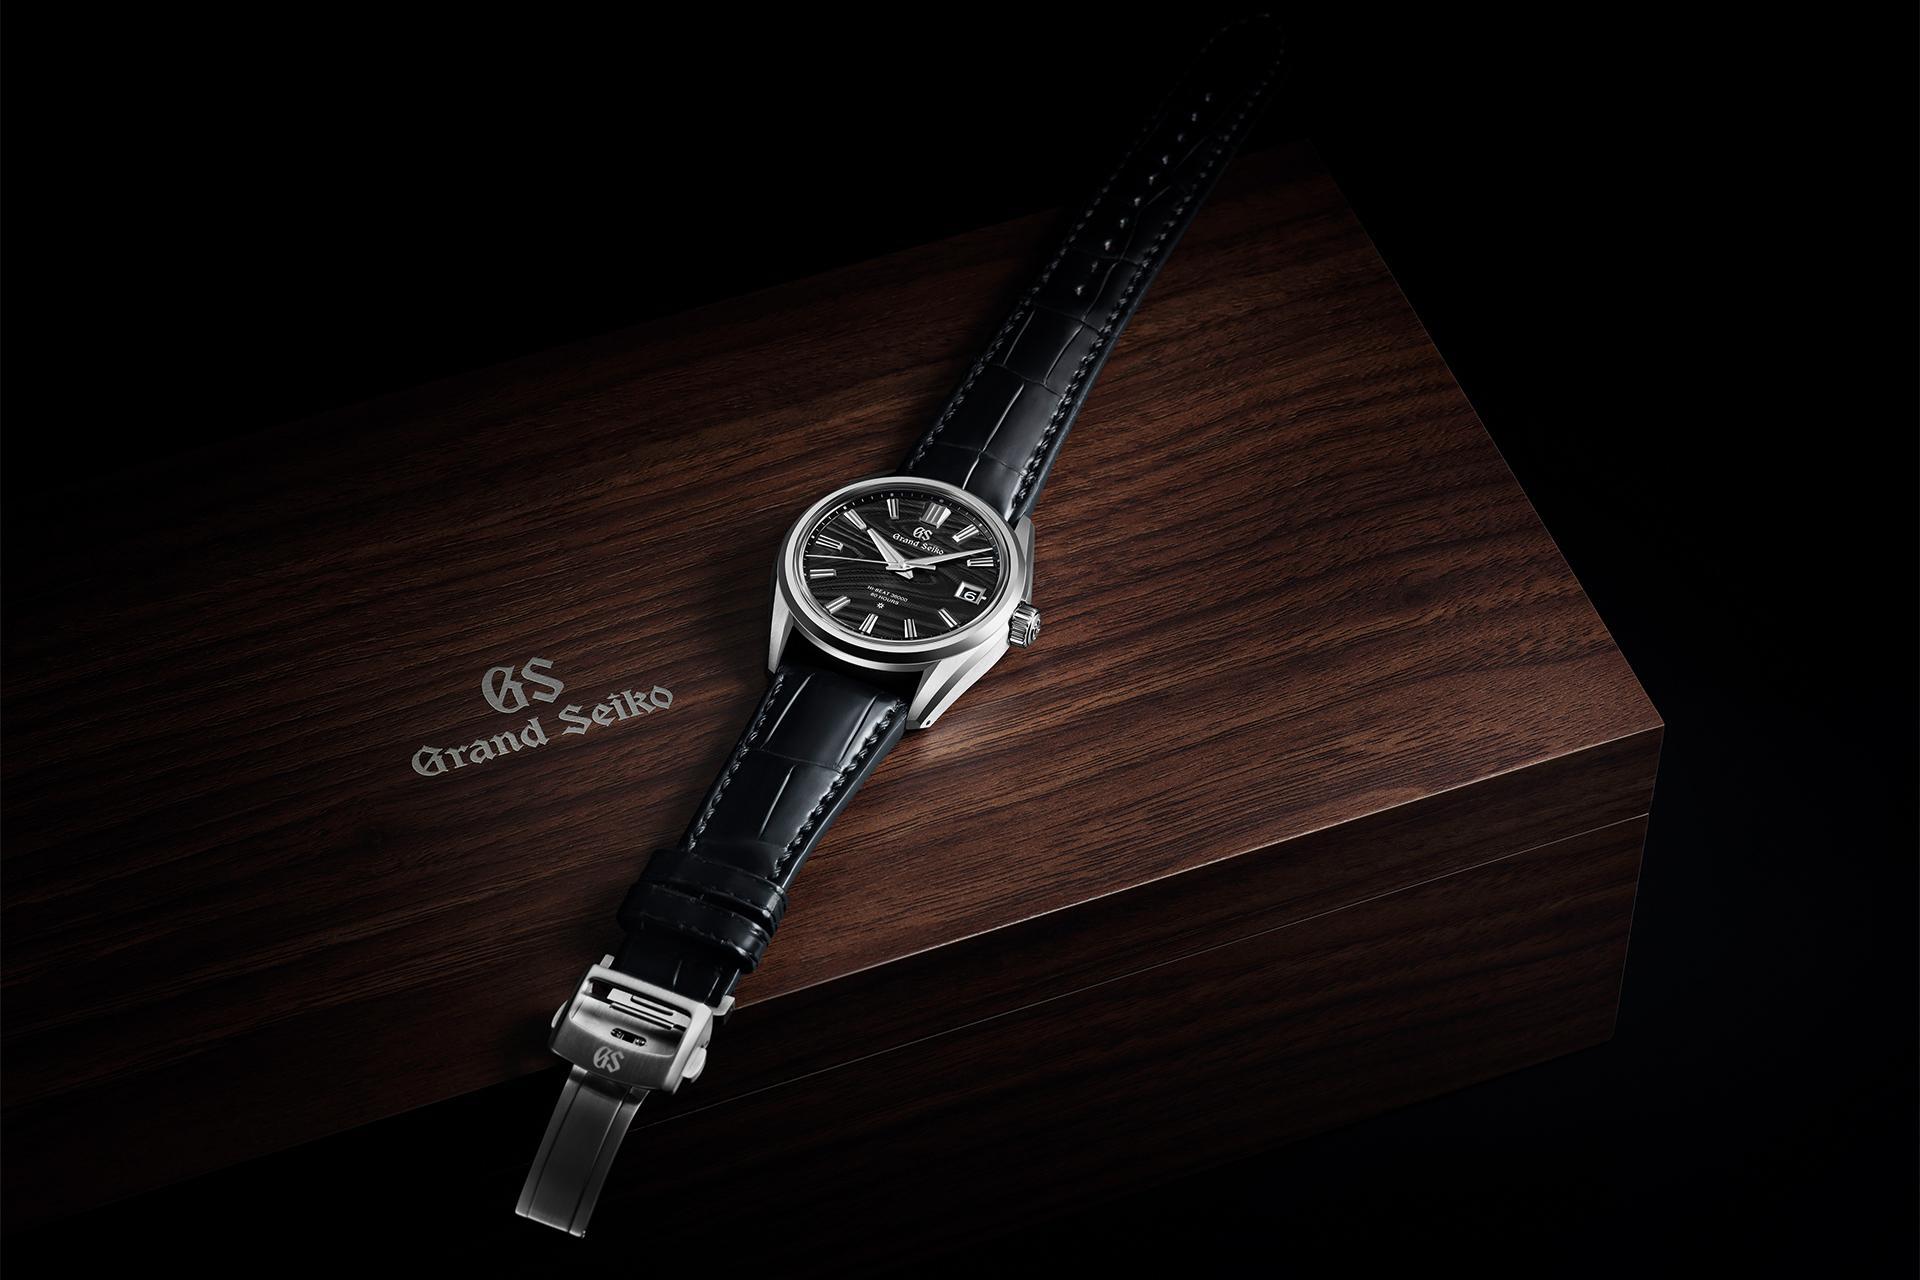 Grand Seiko Platinum High Beat Black Dial Tree Rings Ref SLGH007 2021 watch